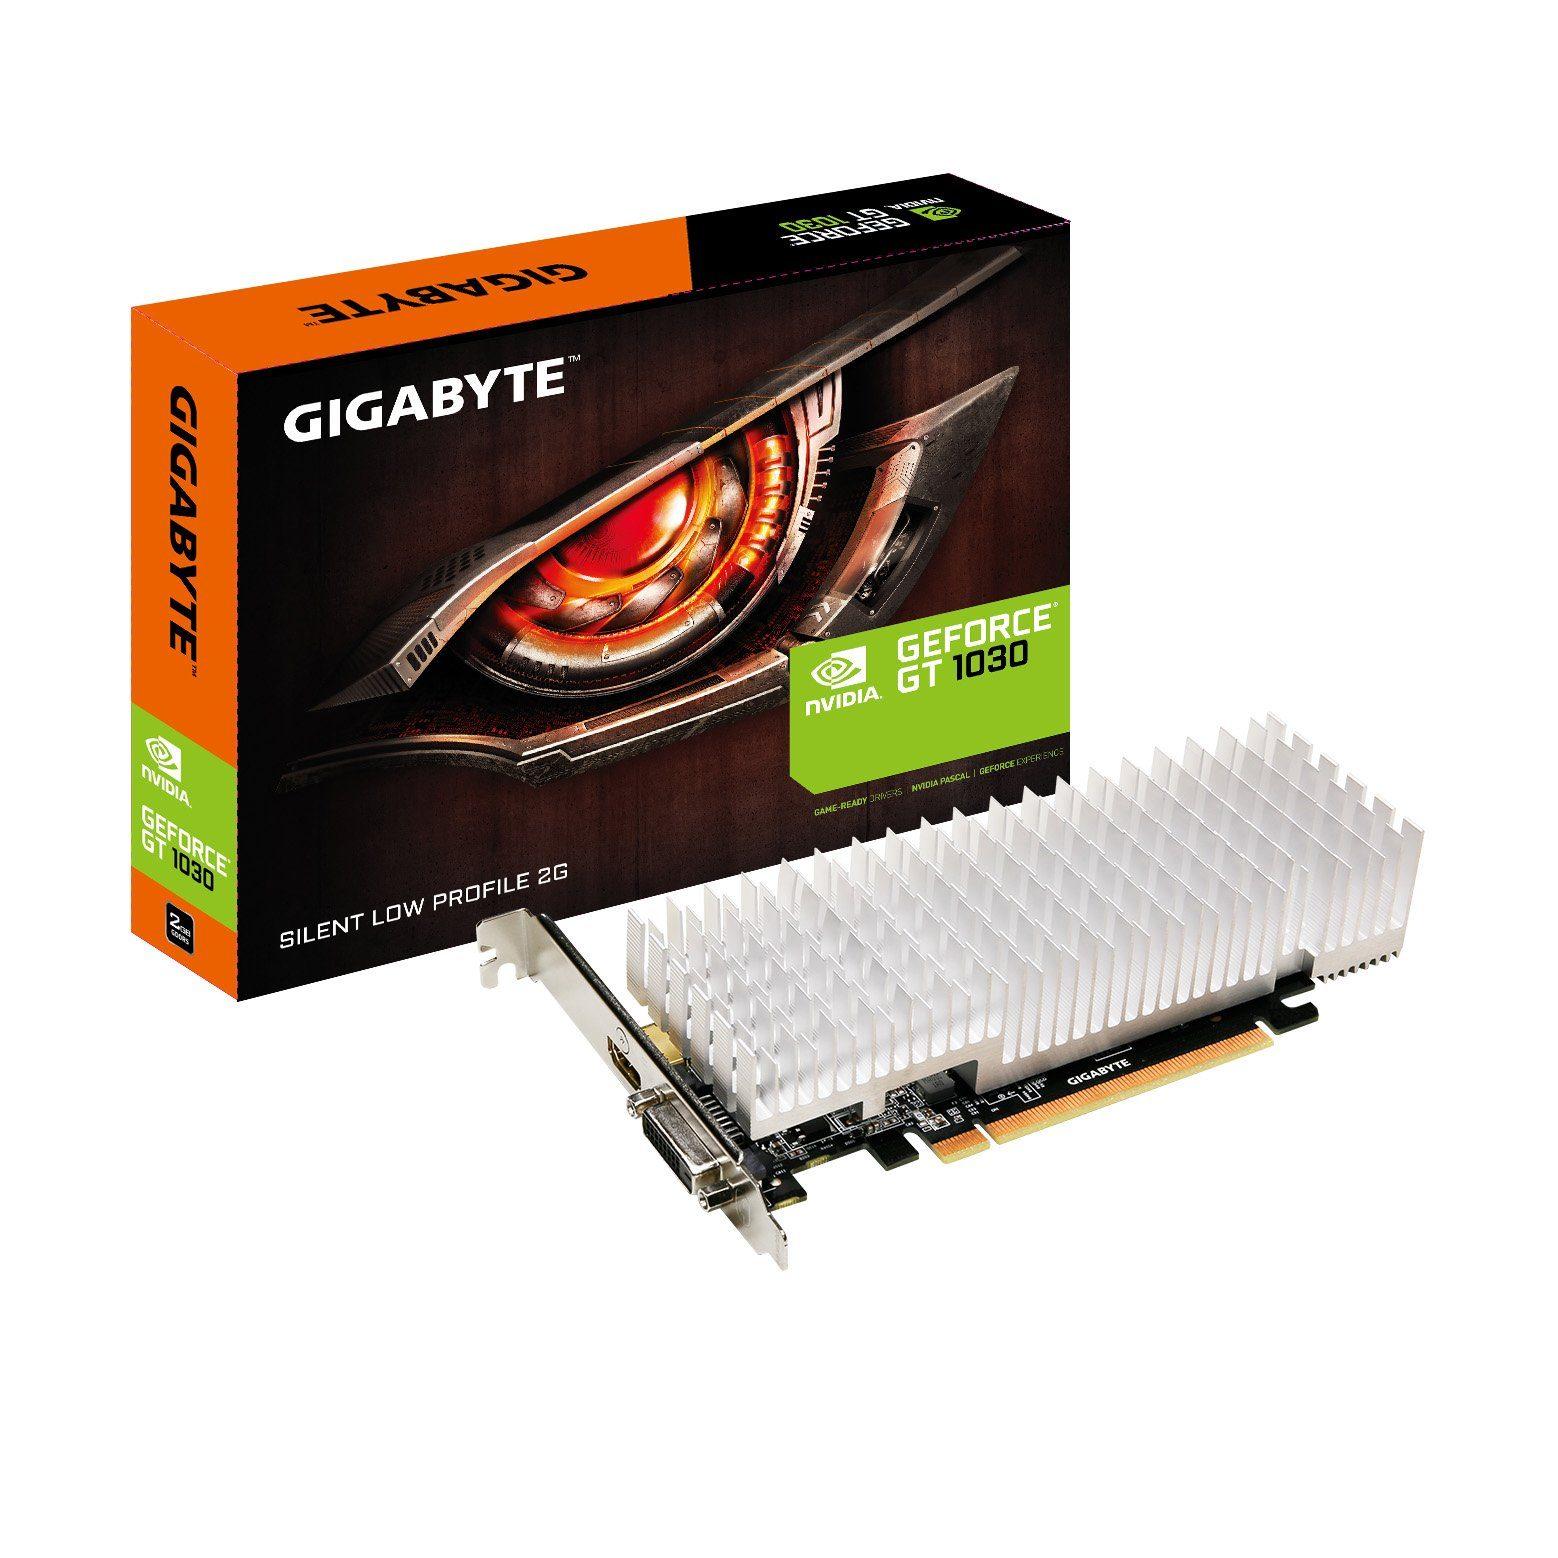 GIGABYTE GeForce® GT 1030 Low Profile 2G, 2GB GDDR5